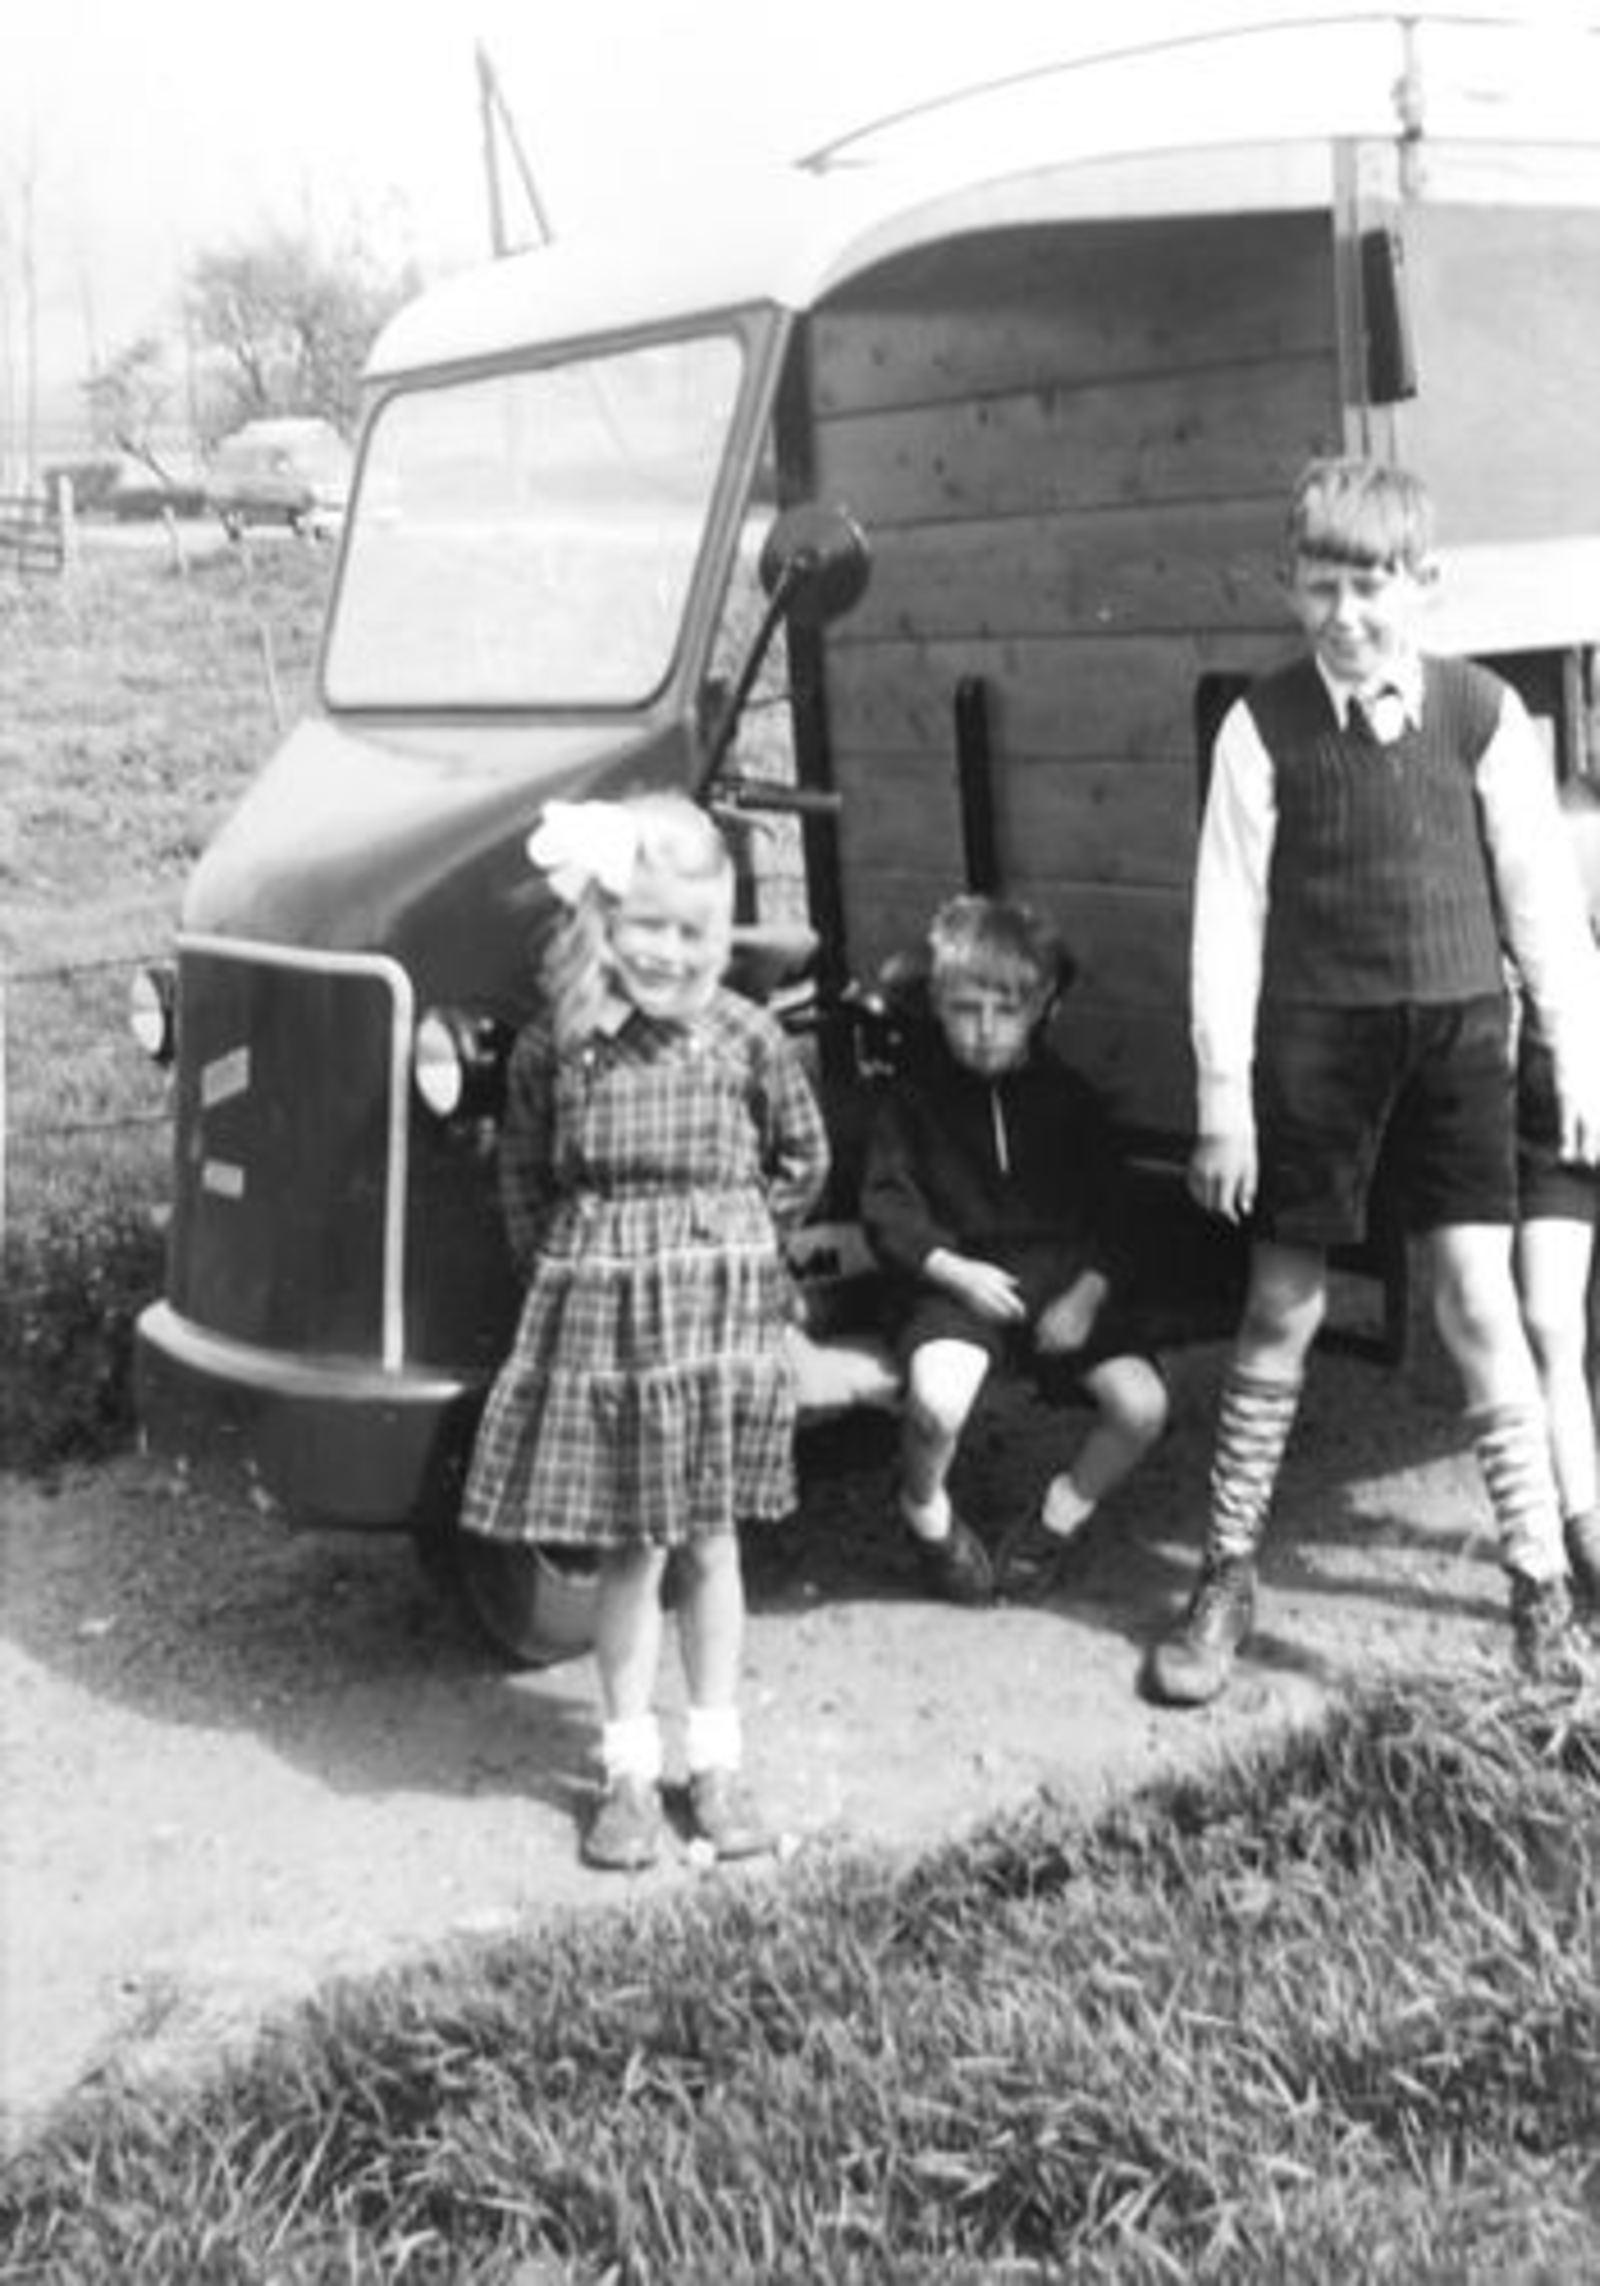 Rip Jacob Sr 1958± Olieboer Motoriseert Bezorging